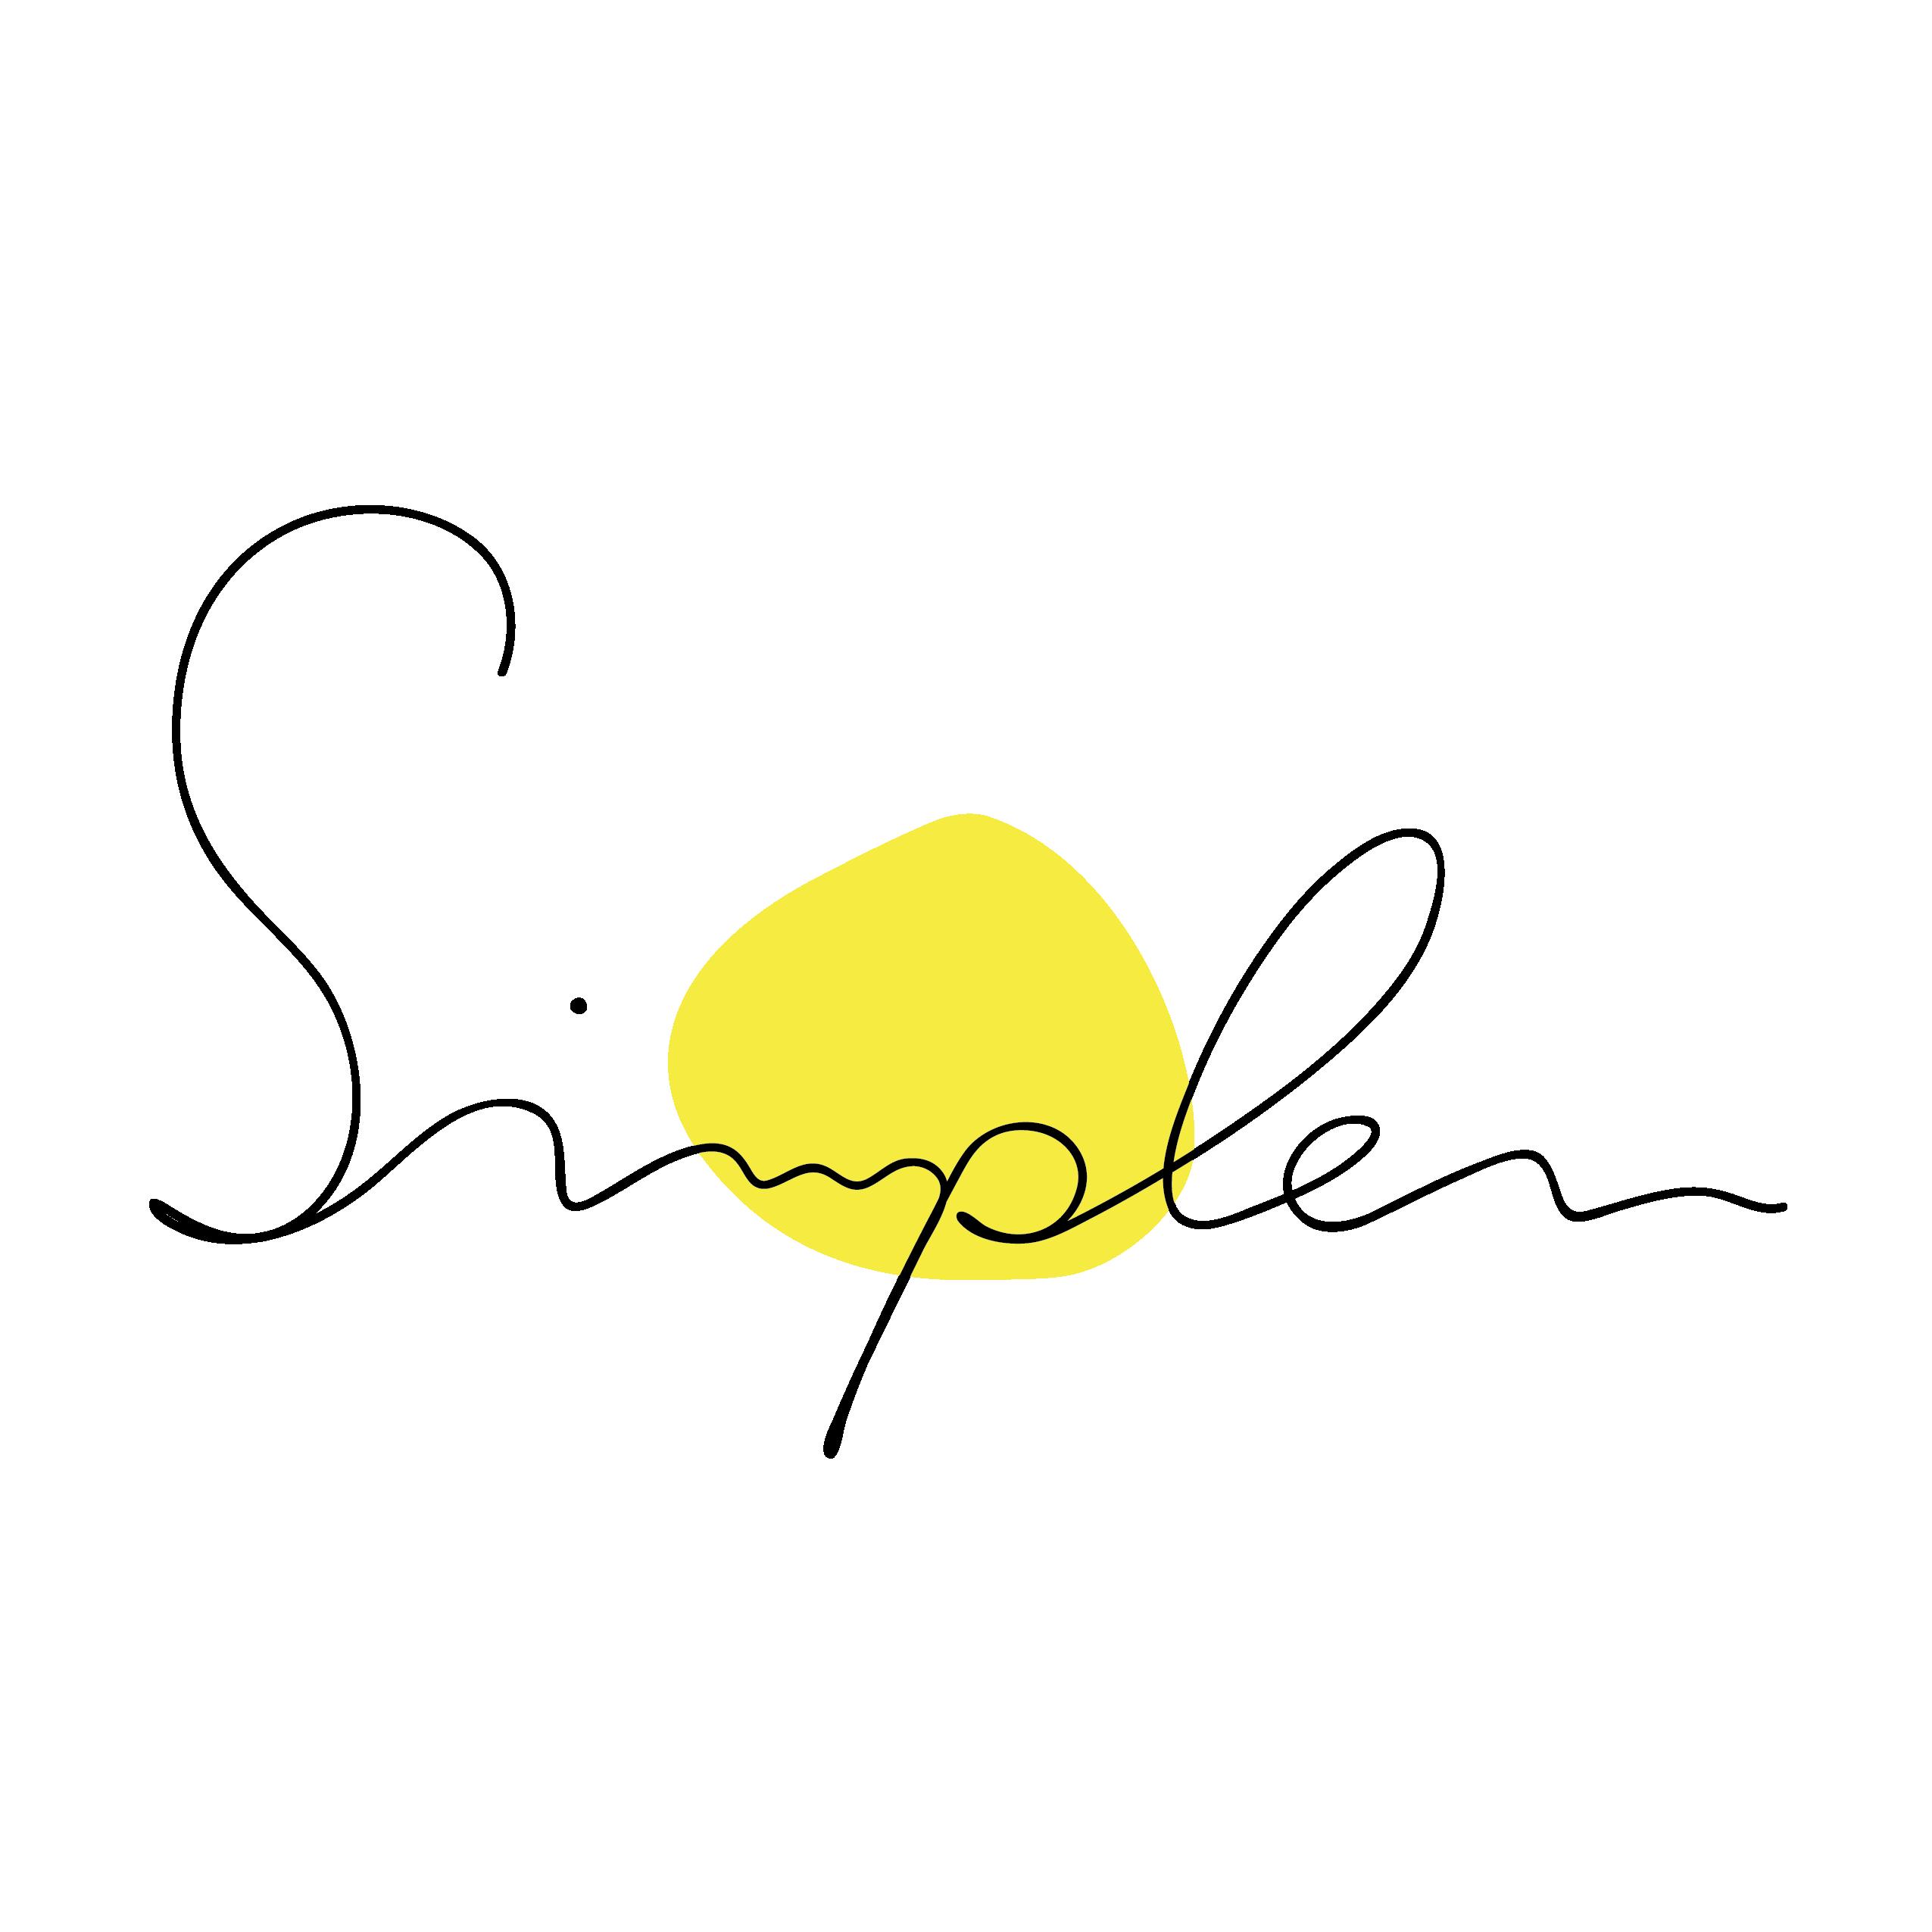 simples_logo_1.png